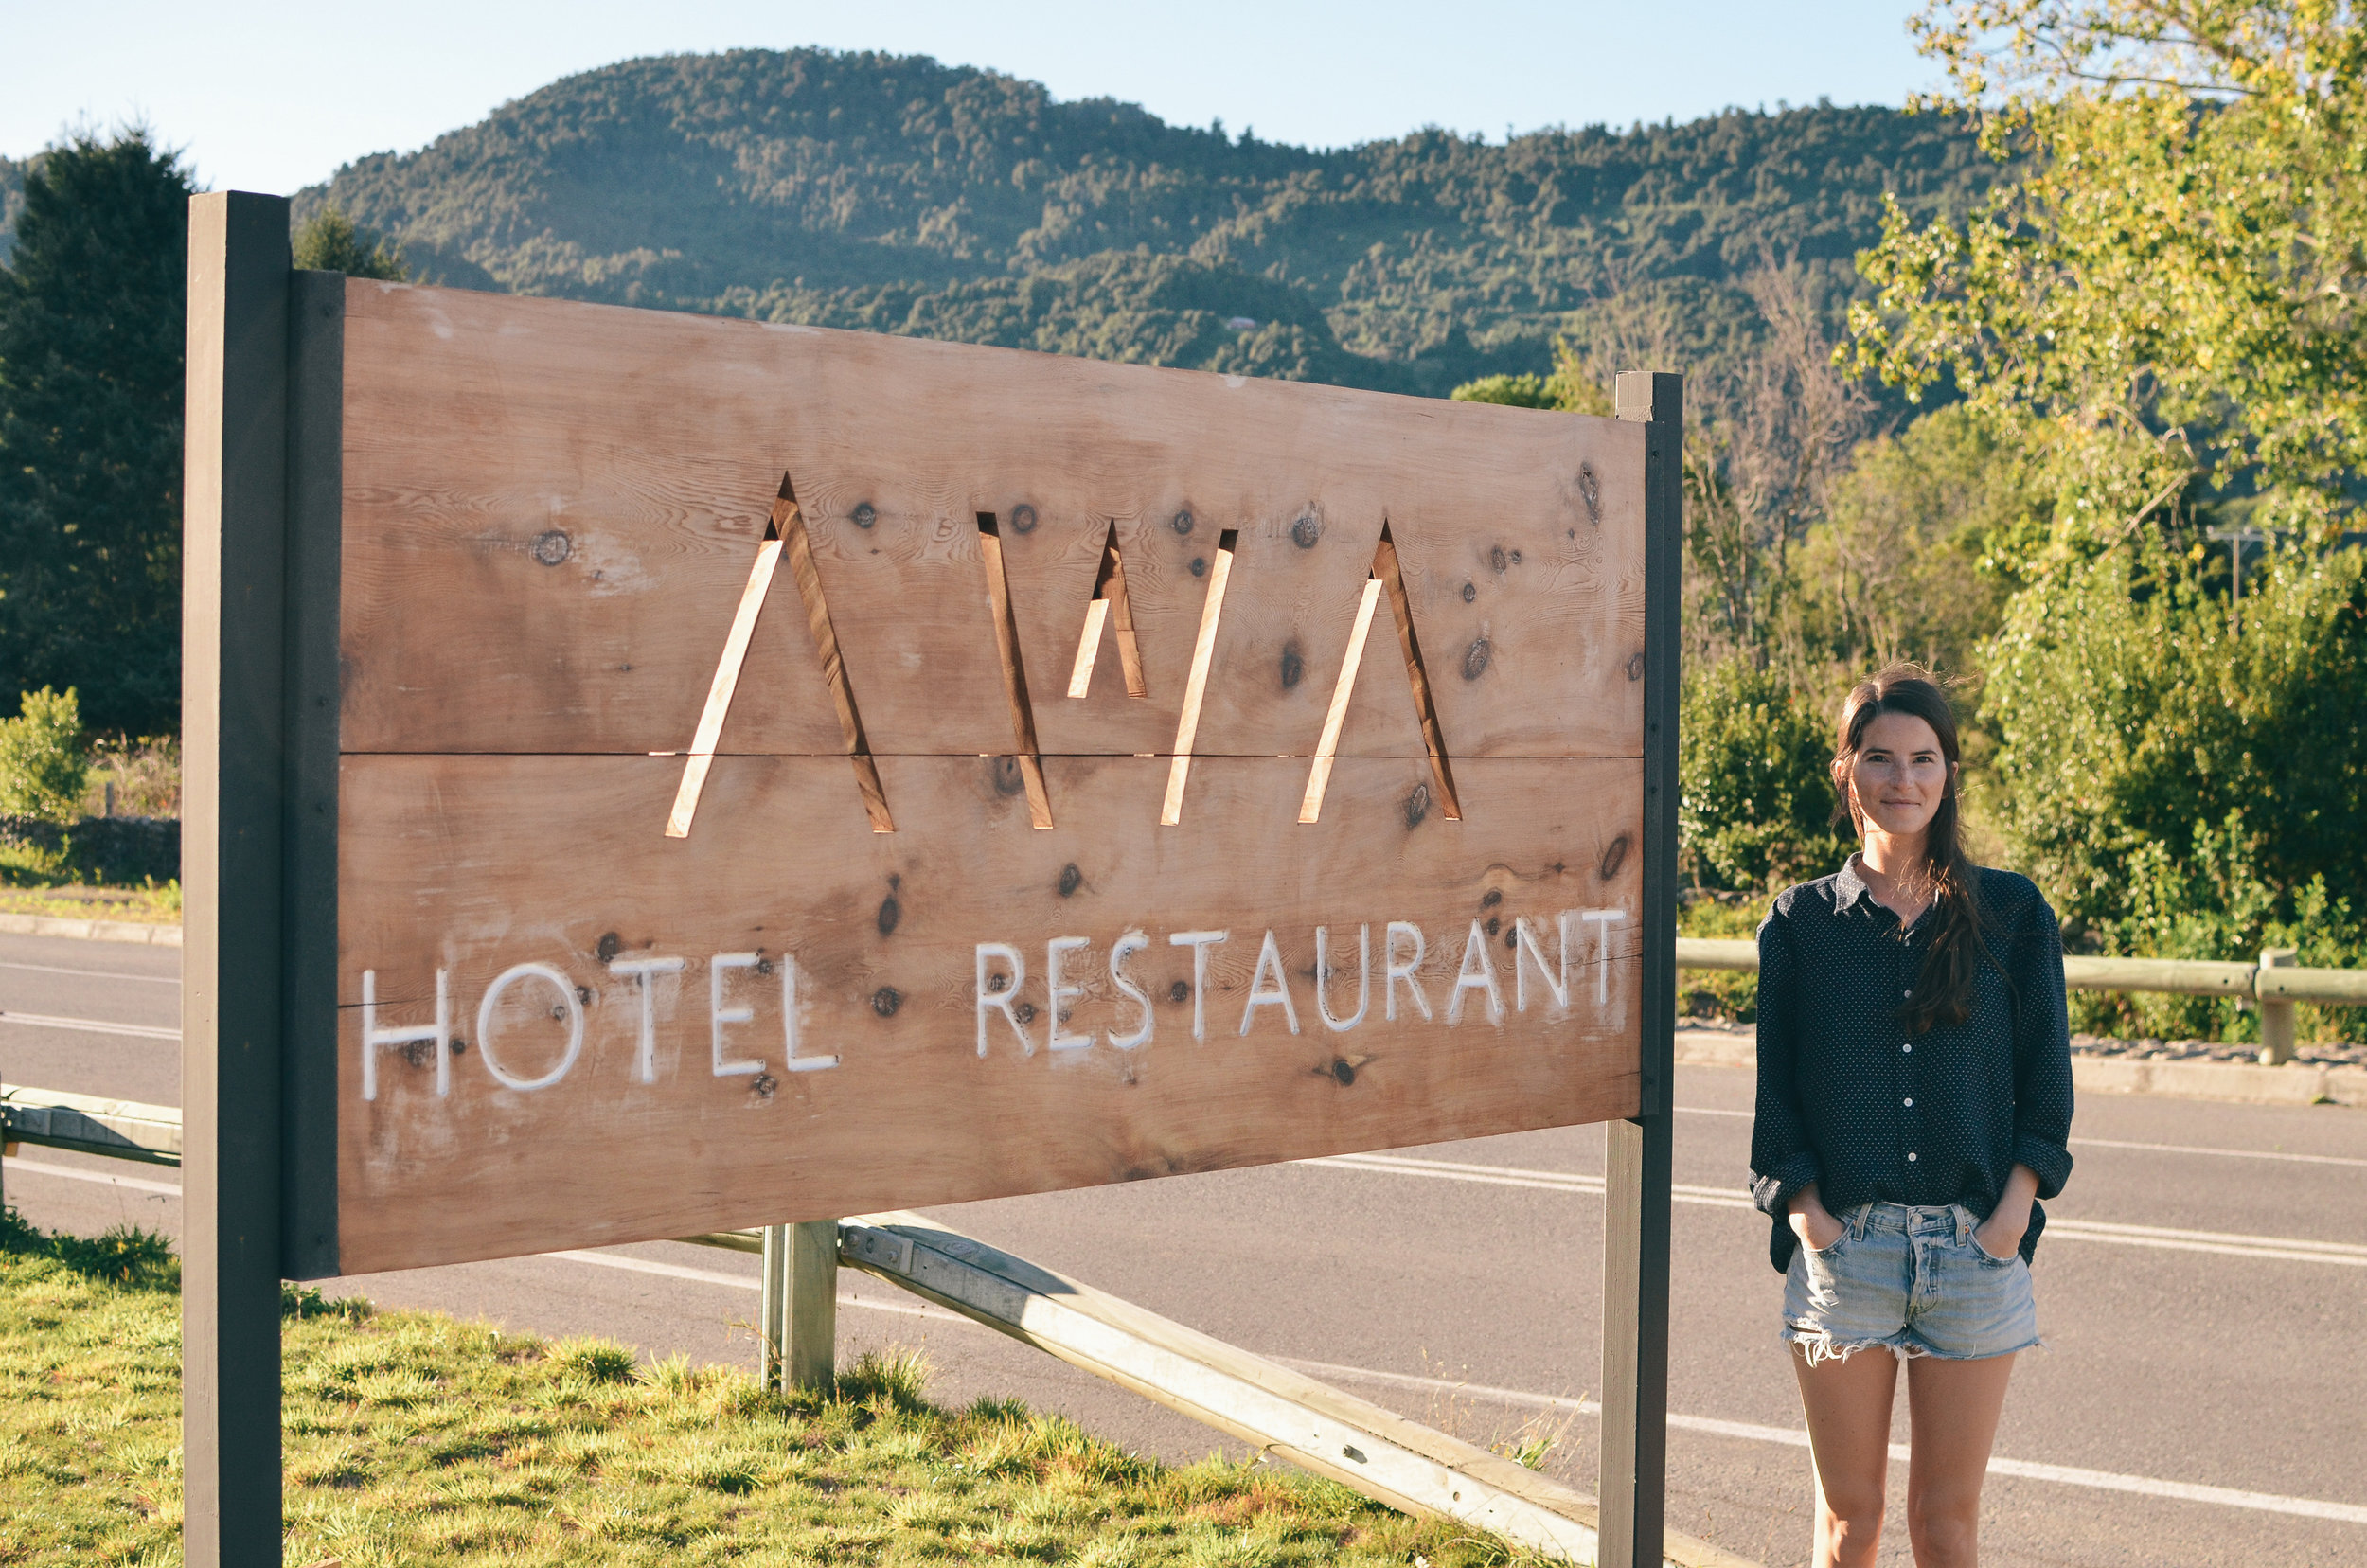 chile+awa+hotel+travel+guide+life+on+pine_DSC_1321.jpg